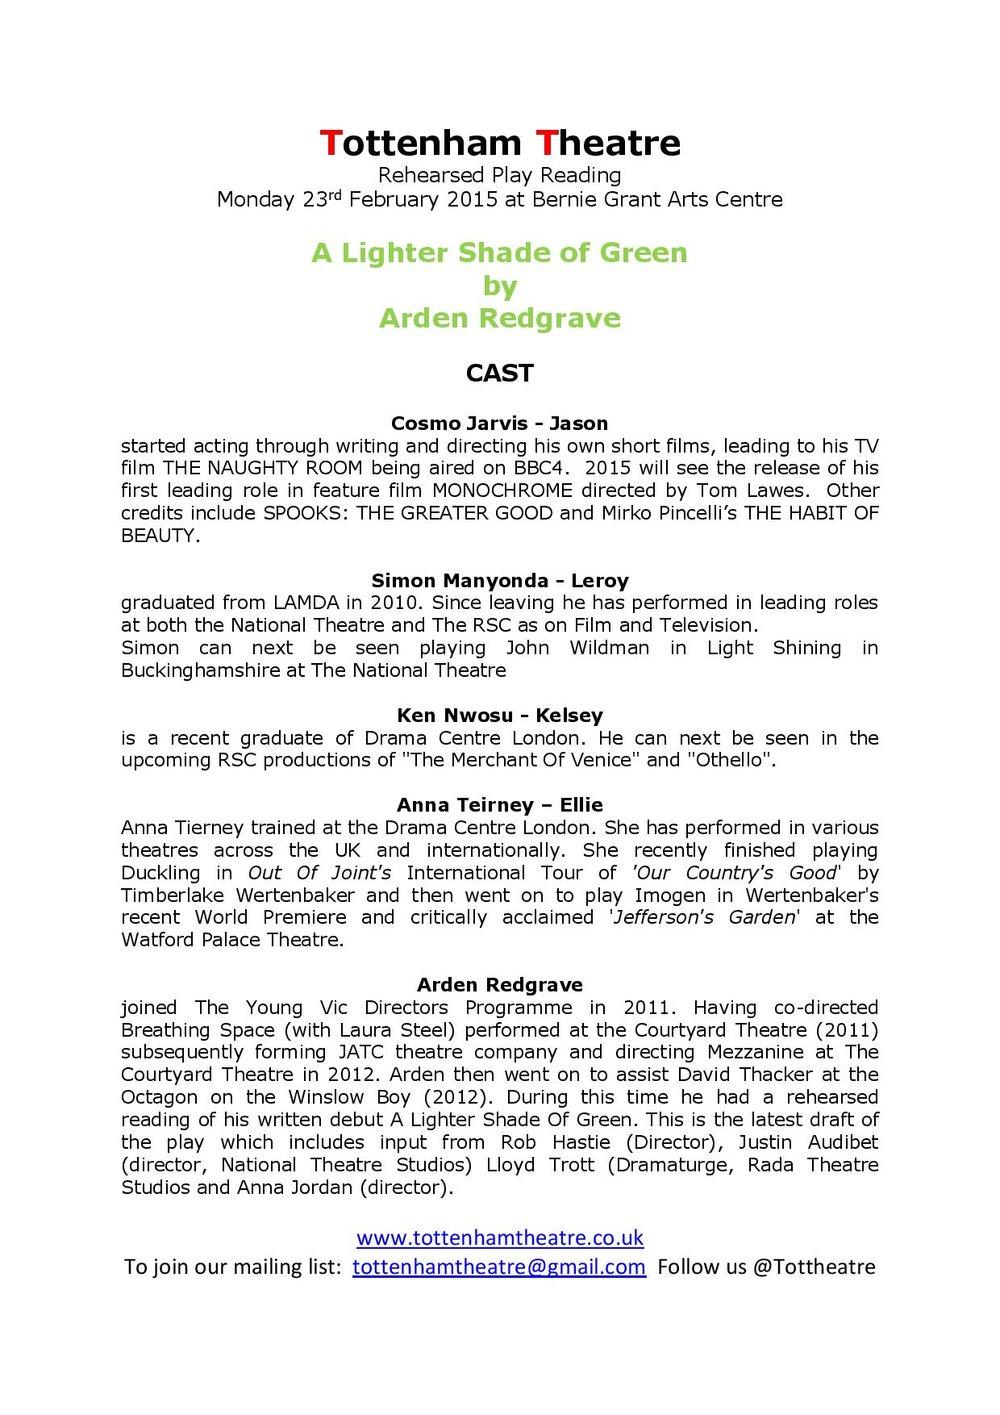 Cast A lighter shade-page-001.jpg